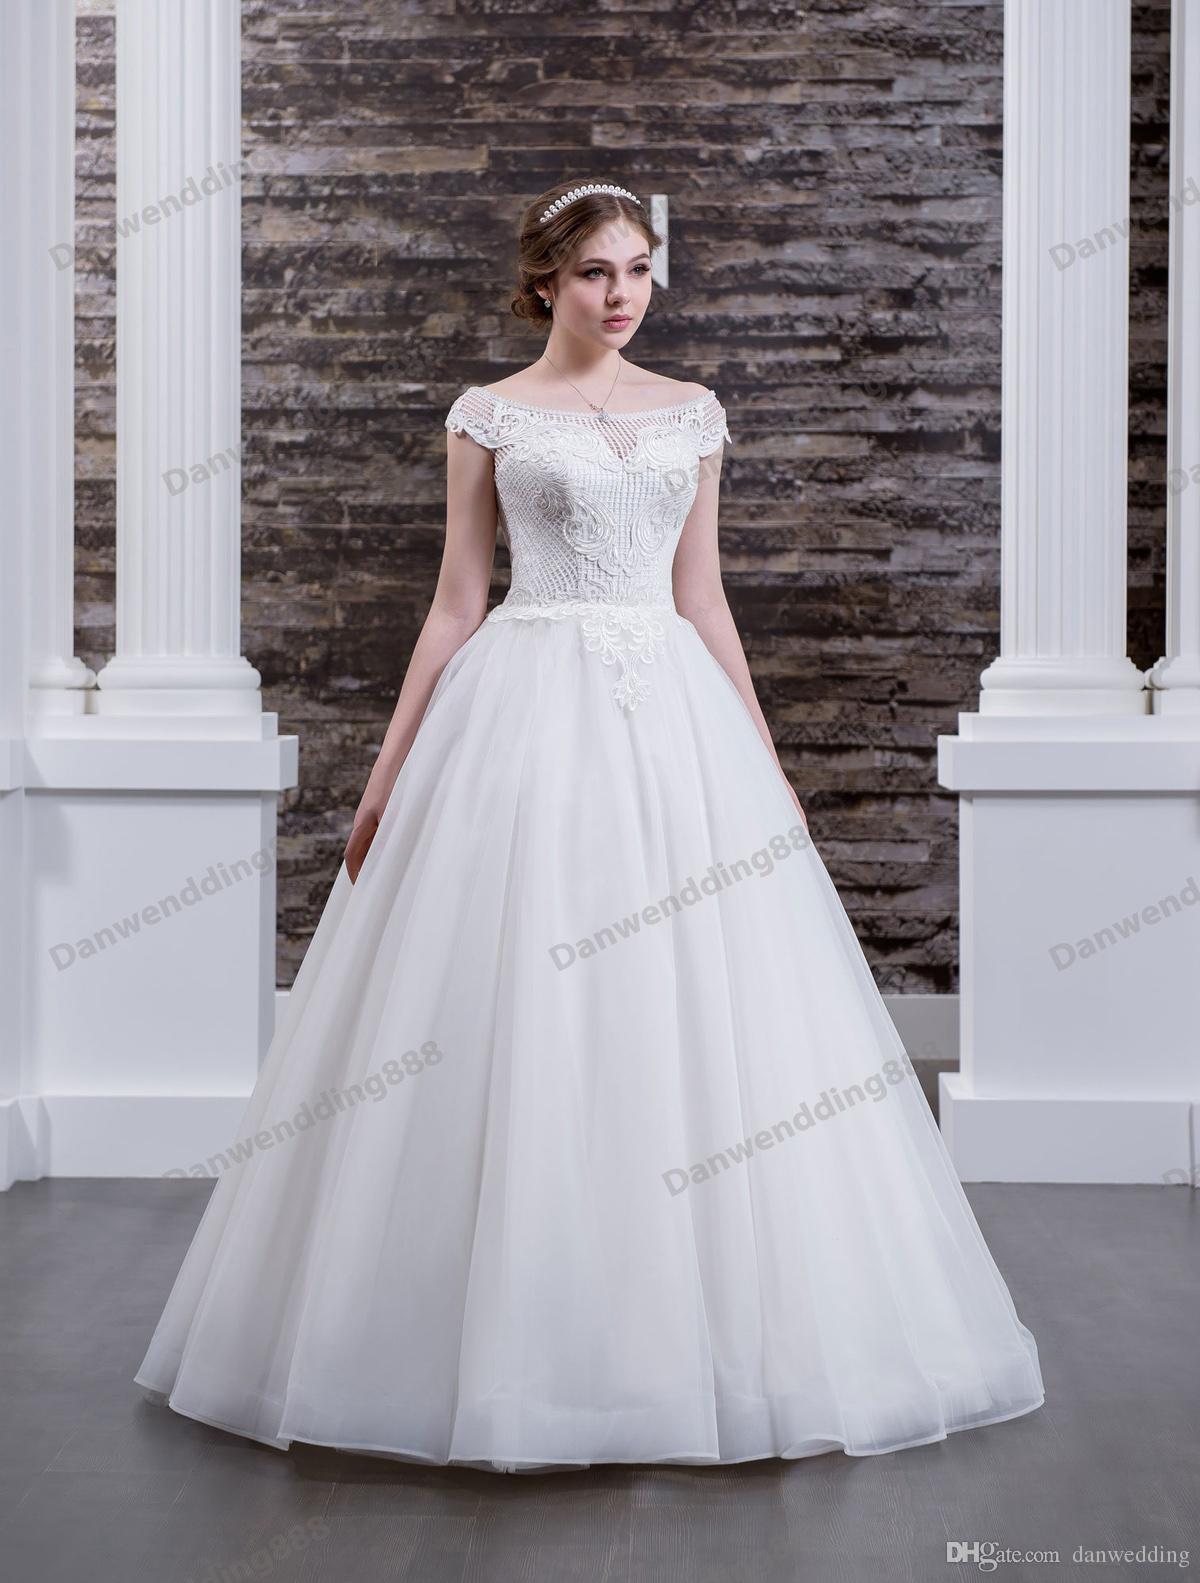 Charming White Tulle Scoop Applique Beads A-Line Wedding Dresses Bridal Pageant Dresses Wedding Attire Dresses Custom Size 2-16 ZW608067